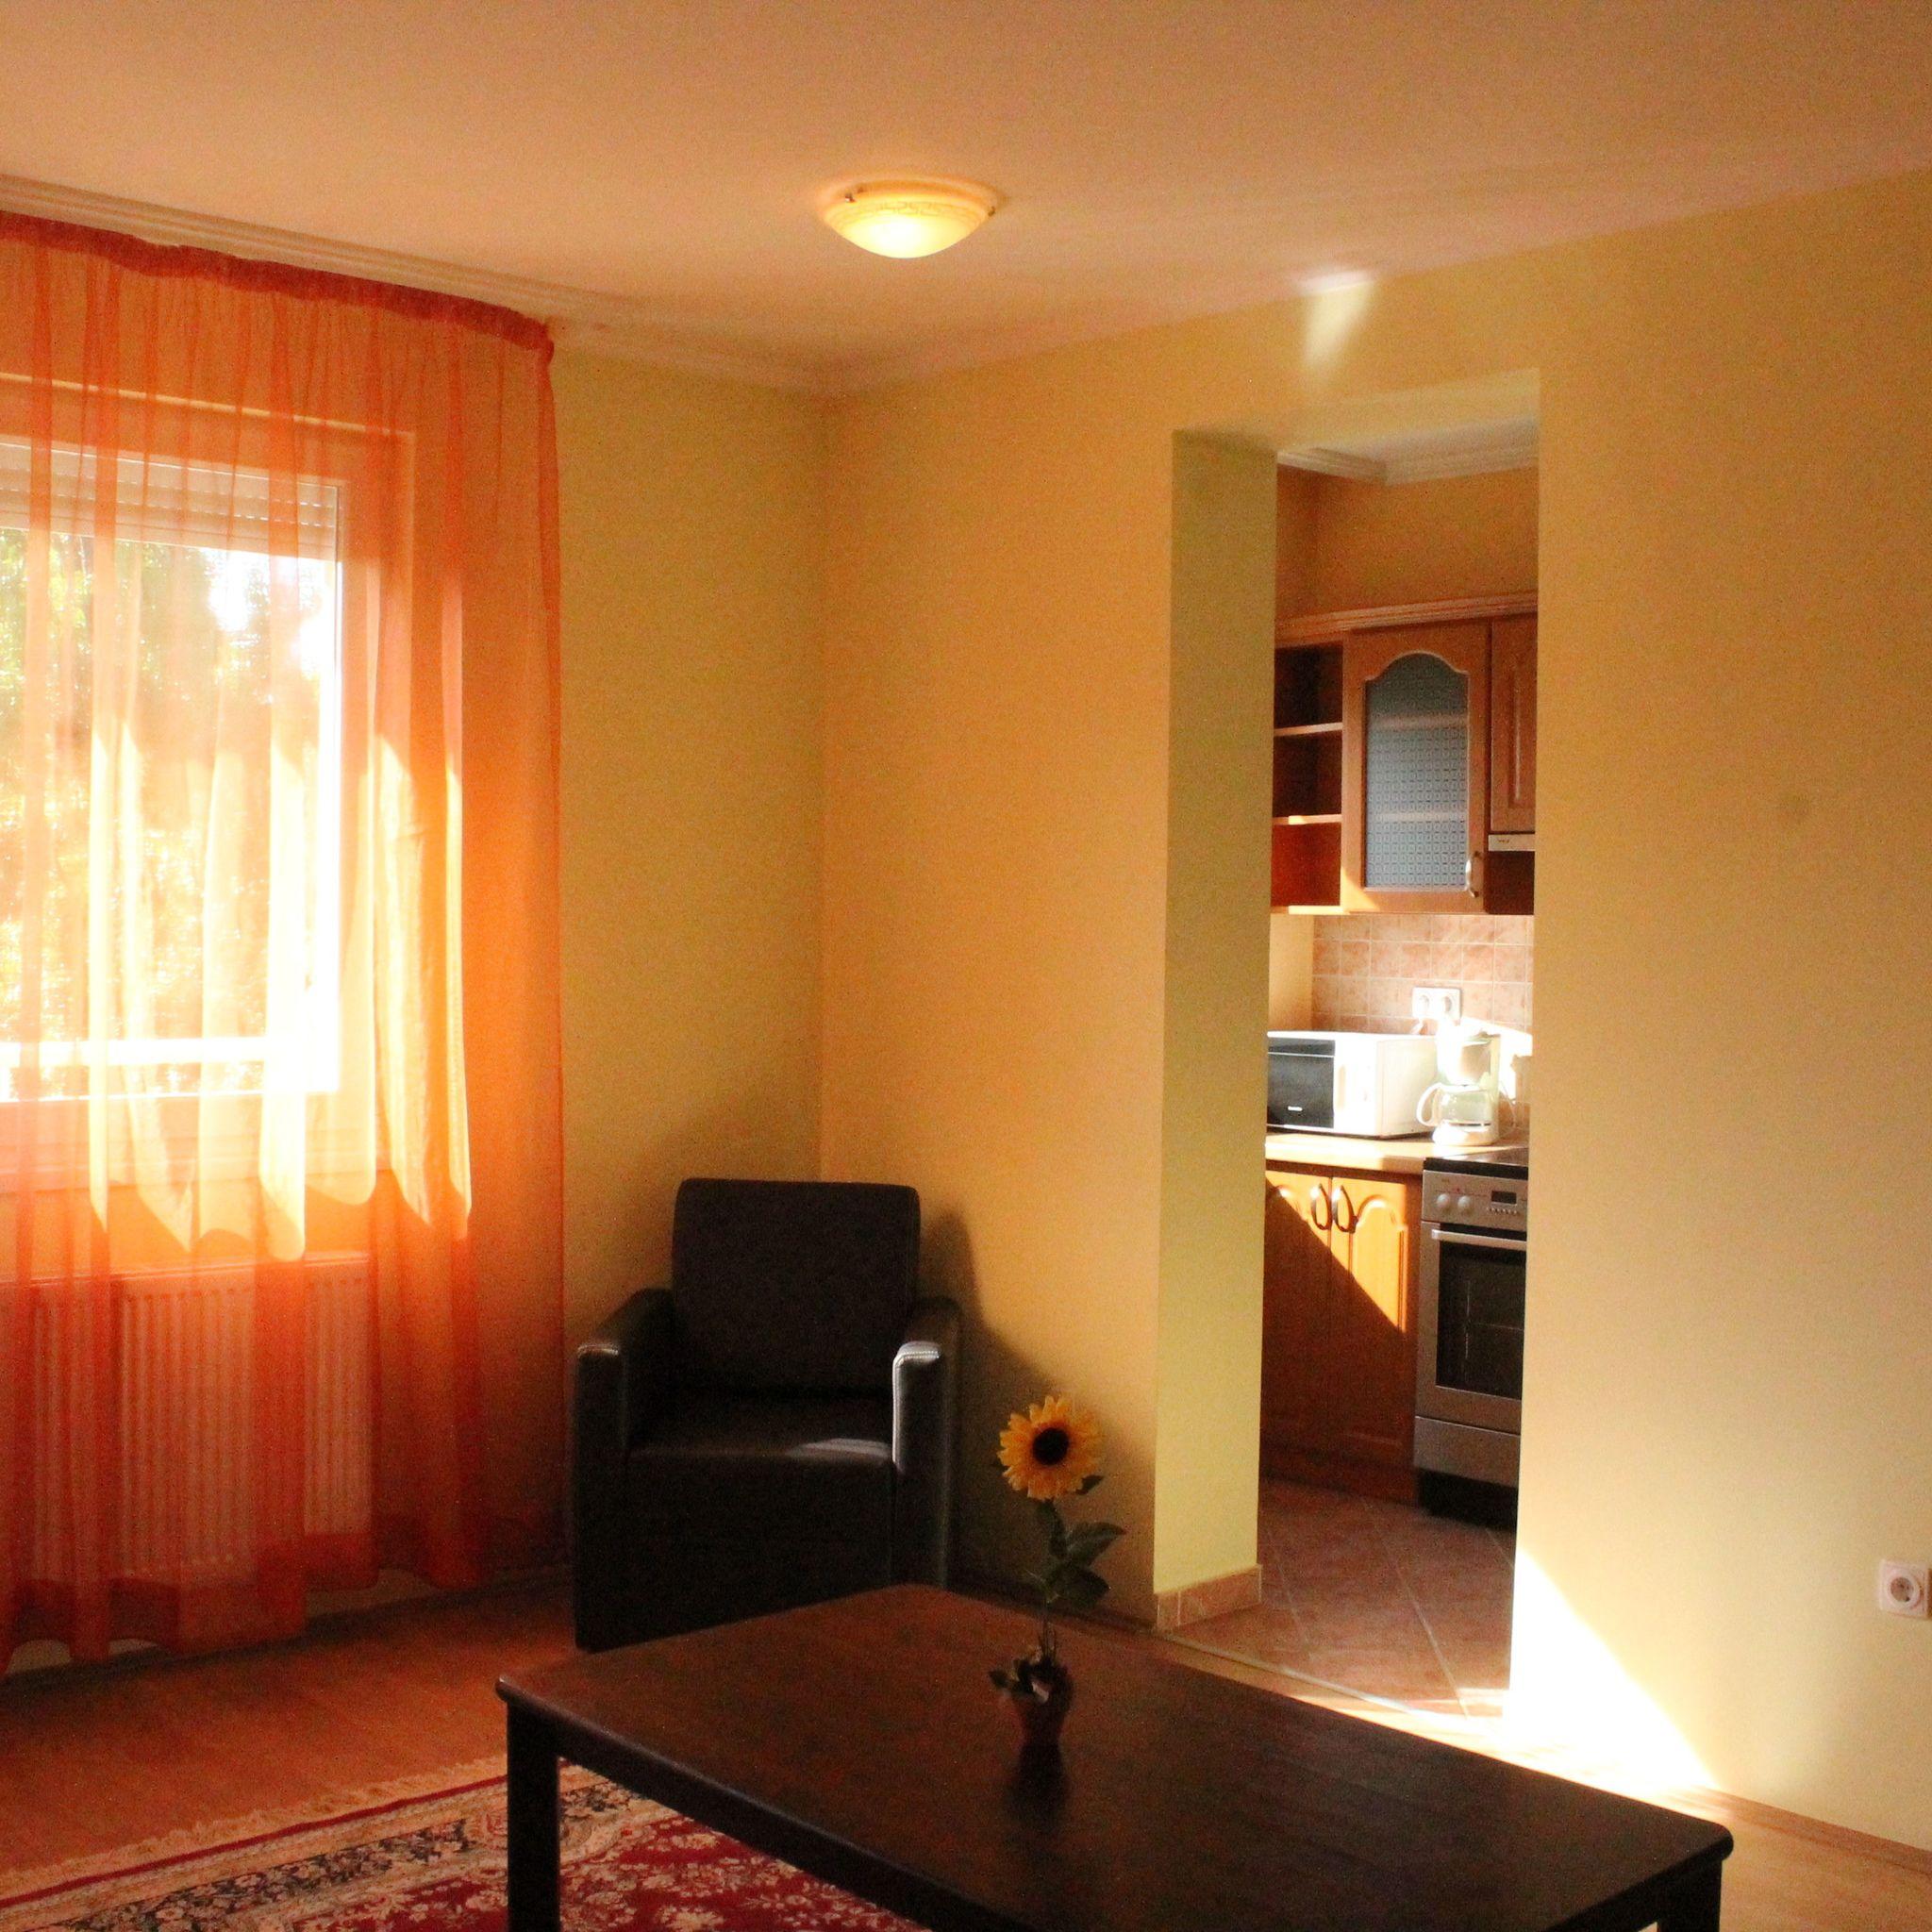 Kitti Apartmanok Hajdúszoboszló  Hotelguru ro